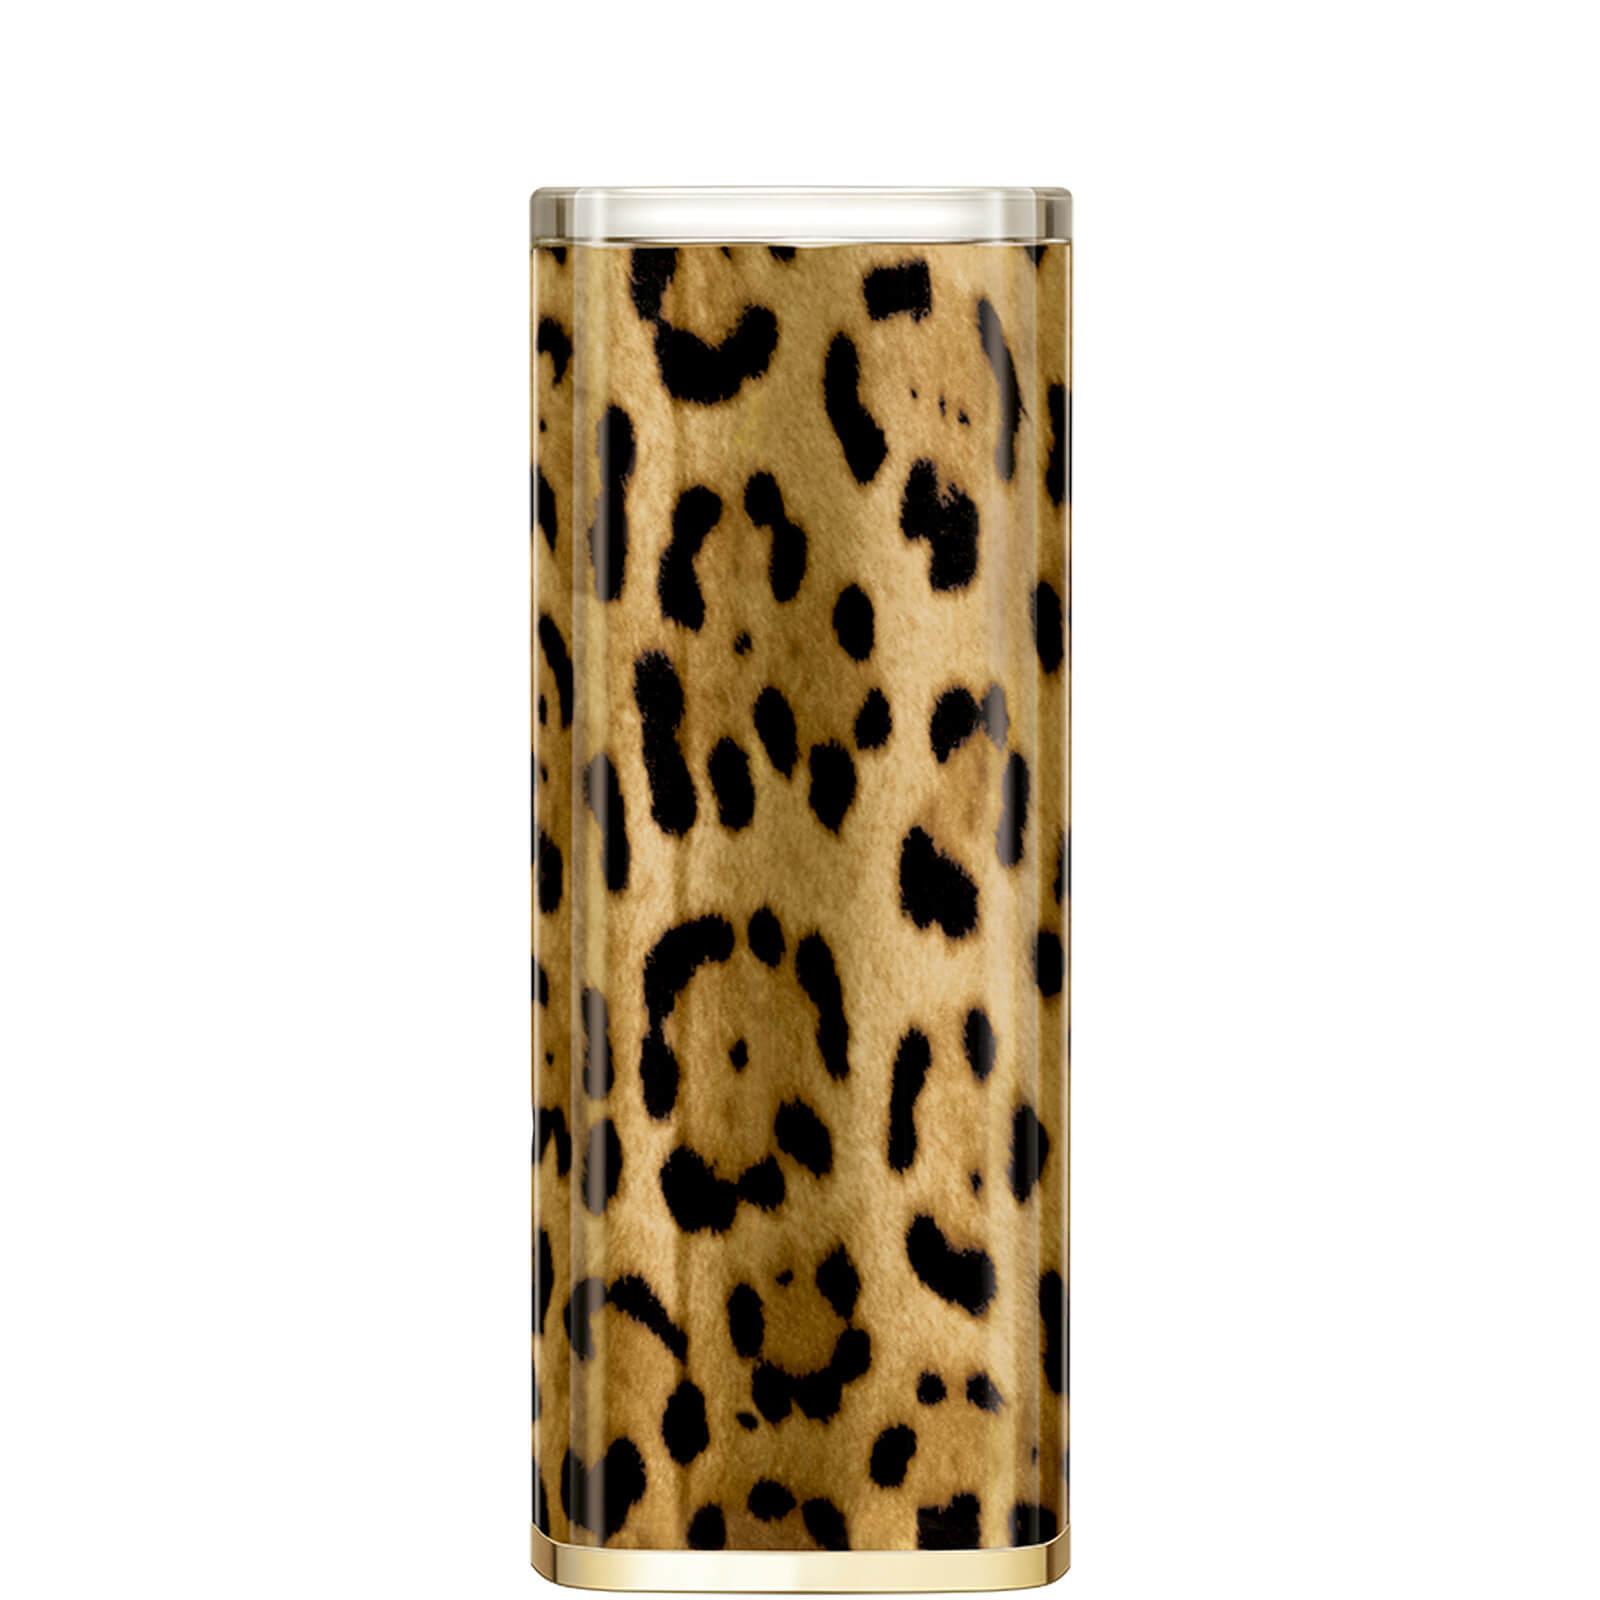 Купить Dolce&Gabbana The Only One Lipstick Cap - Animalier